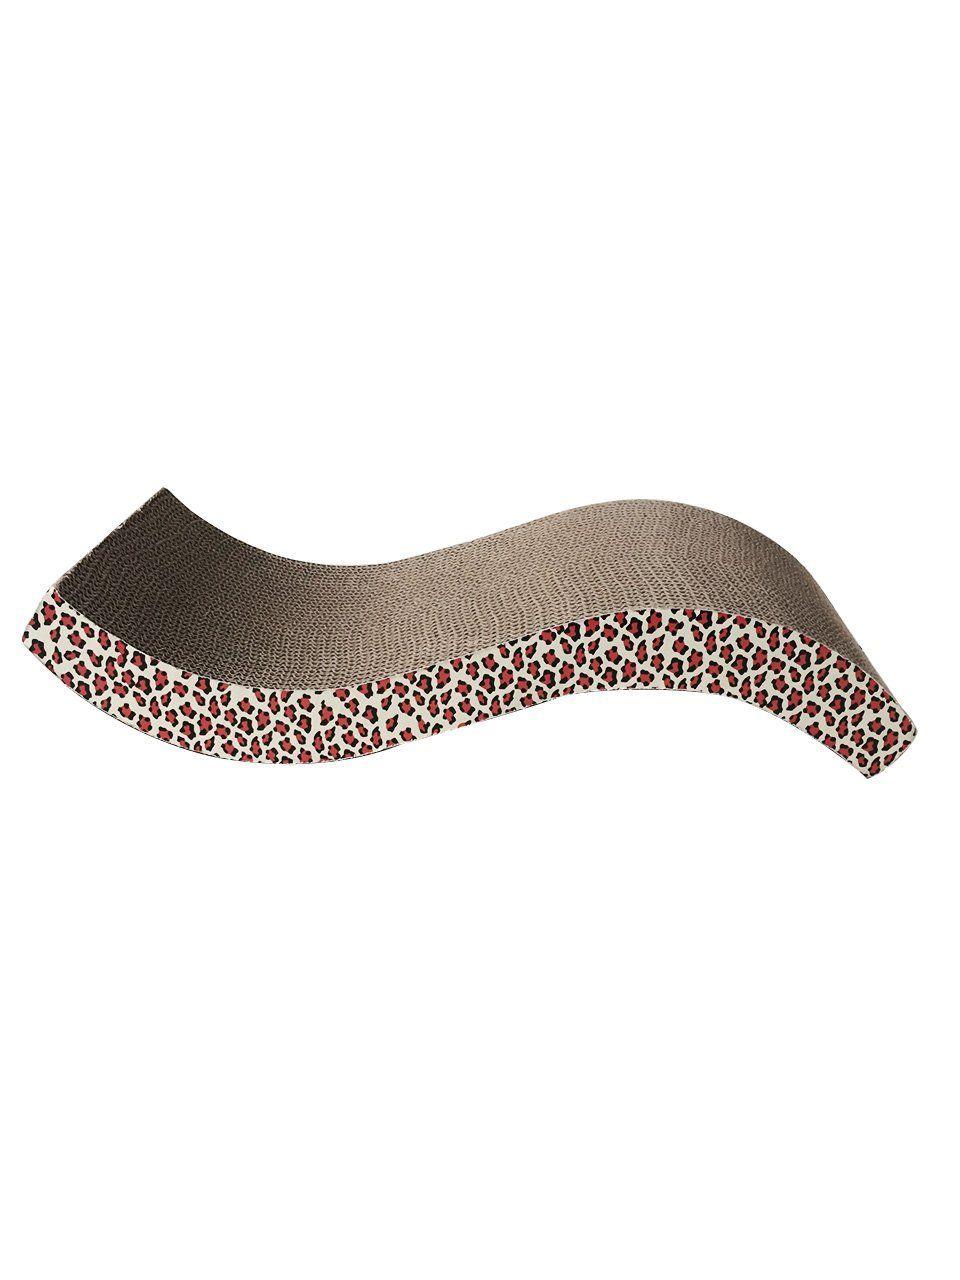 camrom cat hammock scratcher wave shape rest lounge bed pt106  u003e u003e u003e click on the camrom cat hammock scratcher wave shape rest lounge bed pt106      rh   pinterest